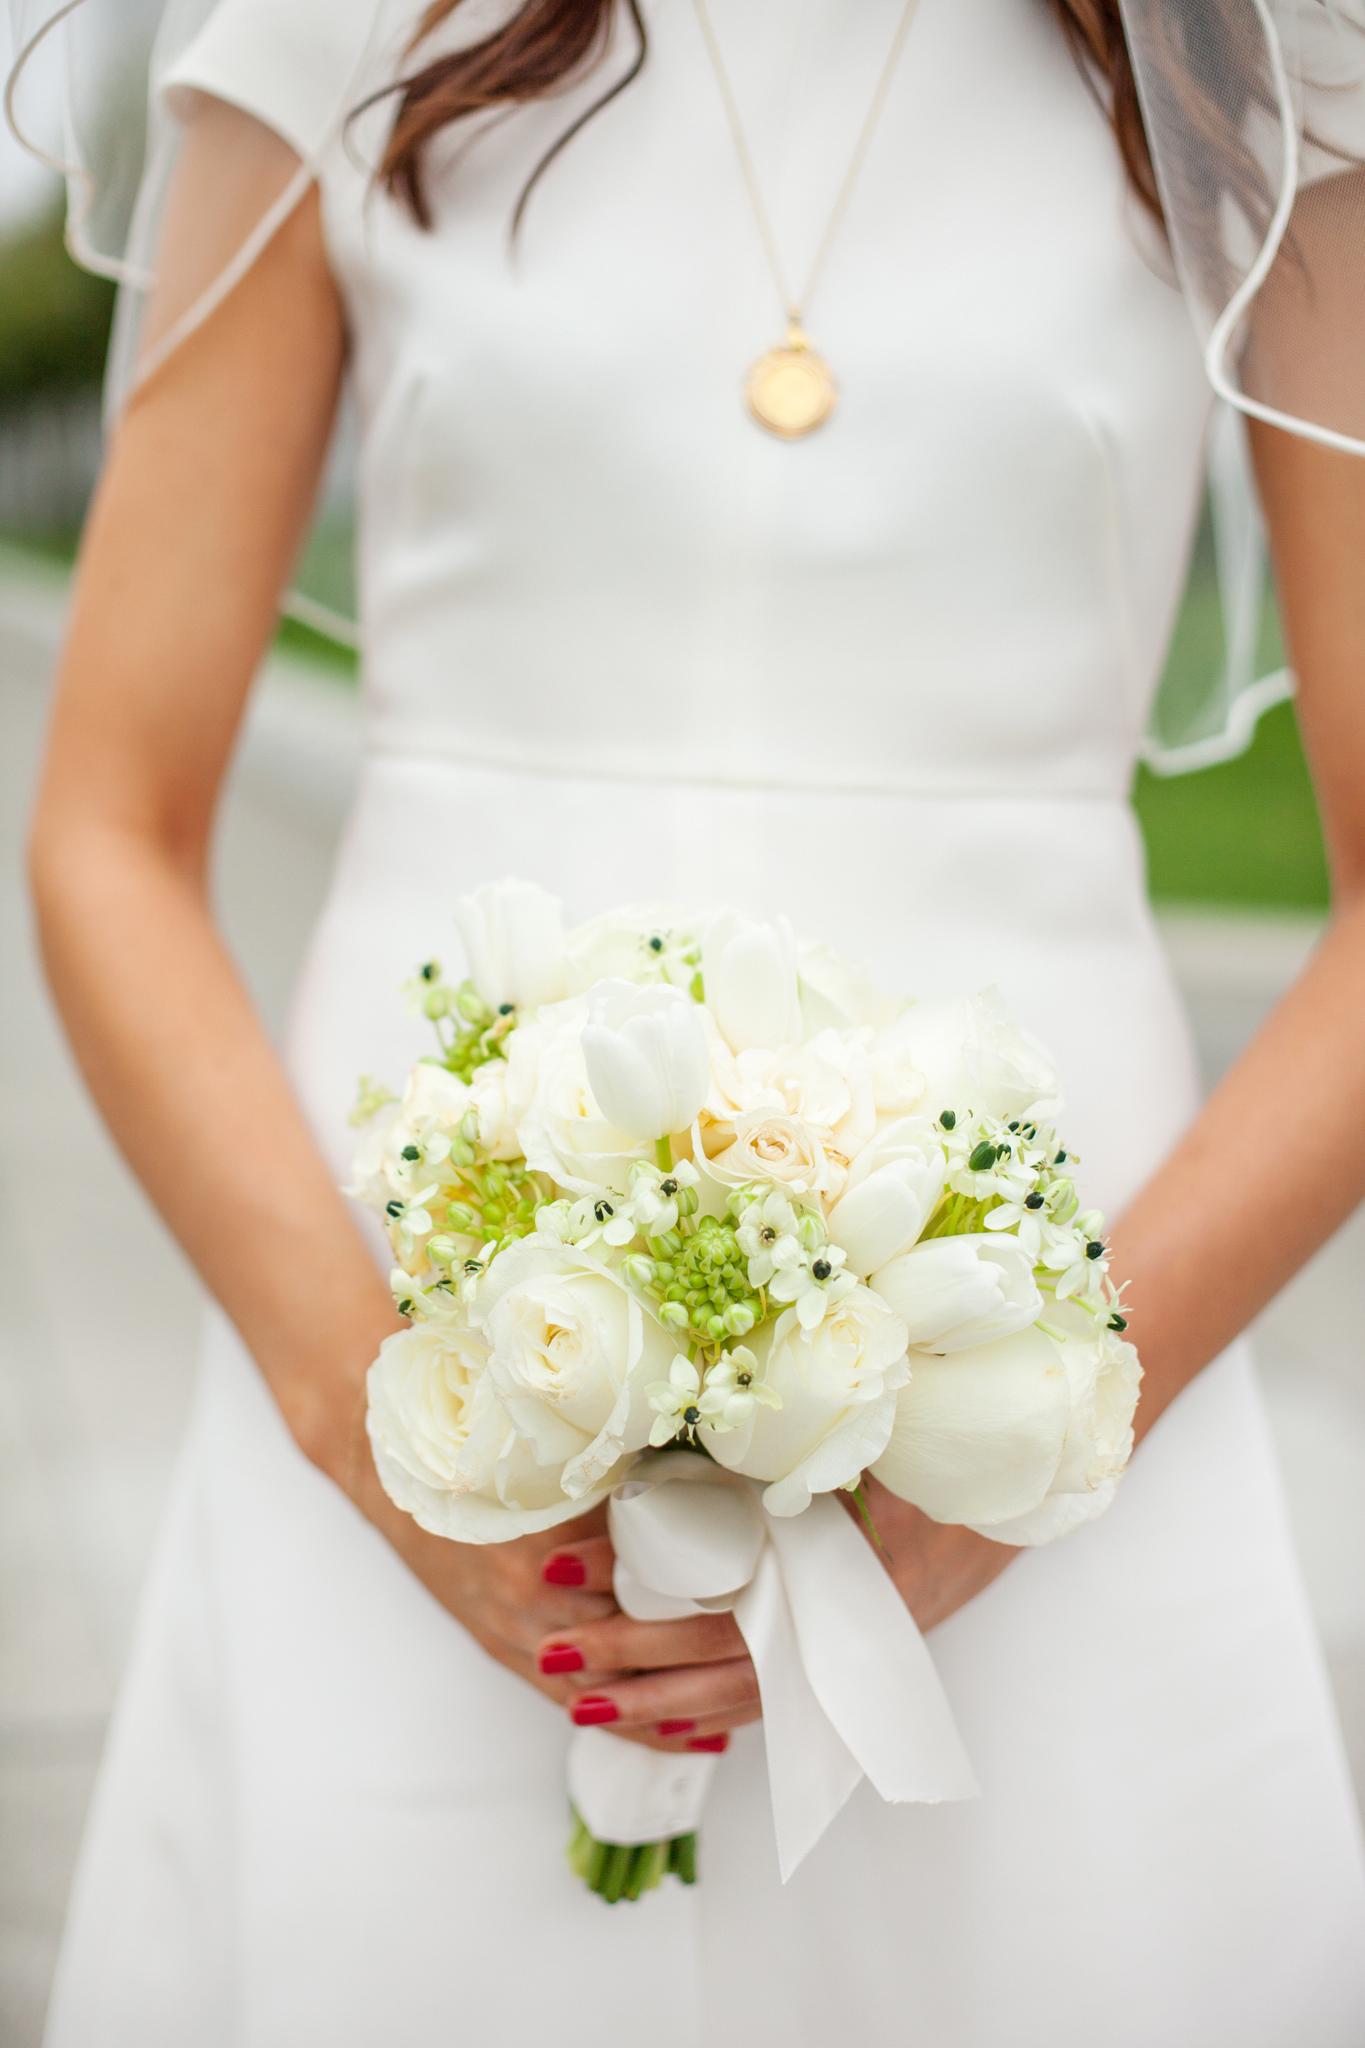 3-white-rose-bouquet.jpg